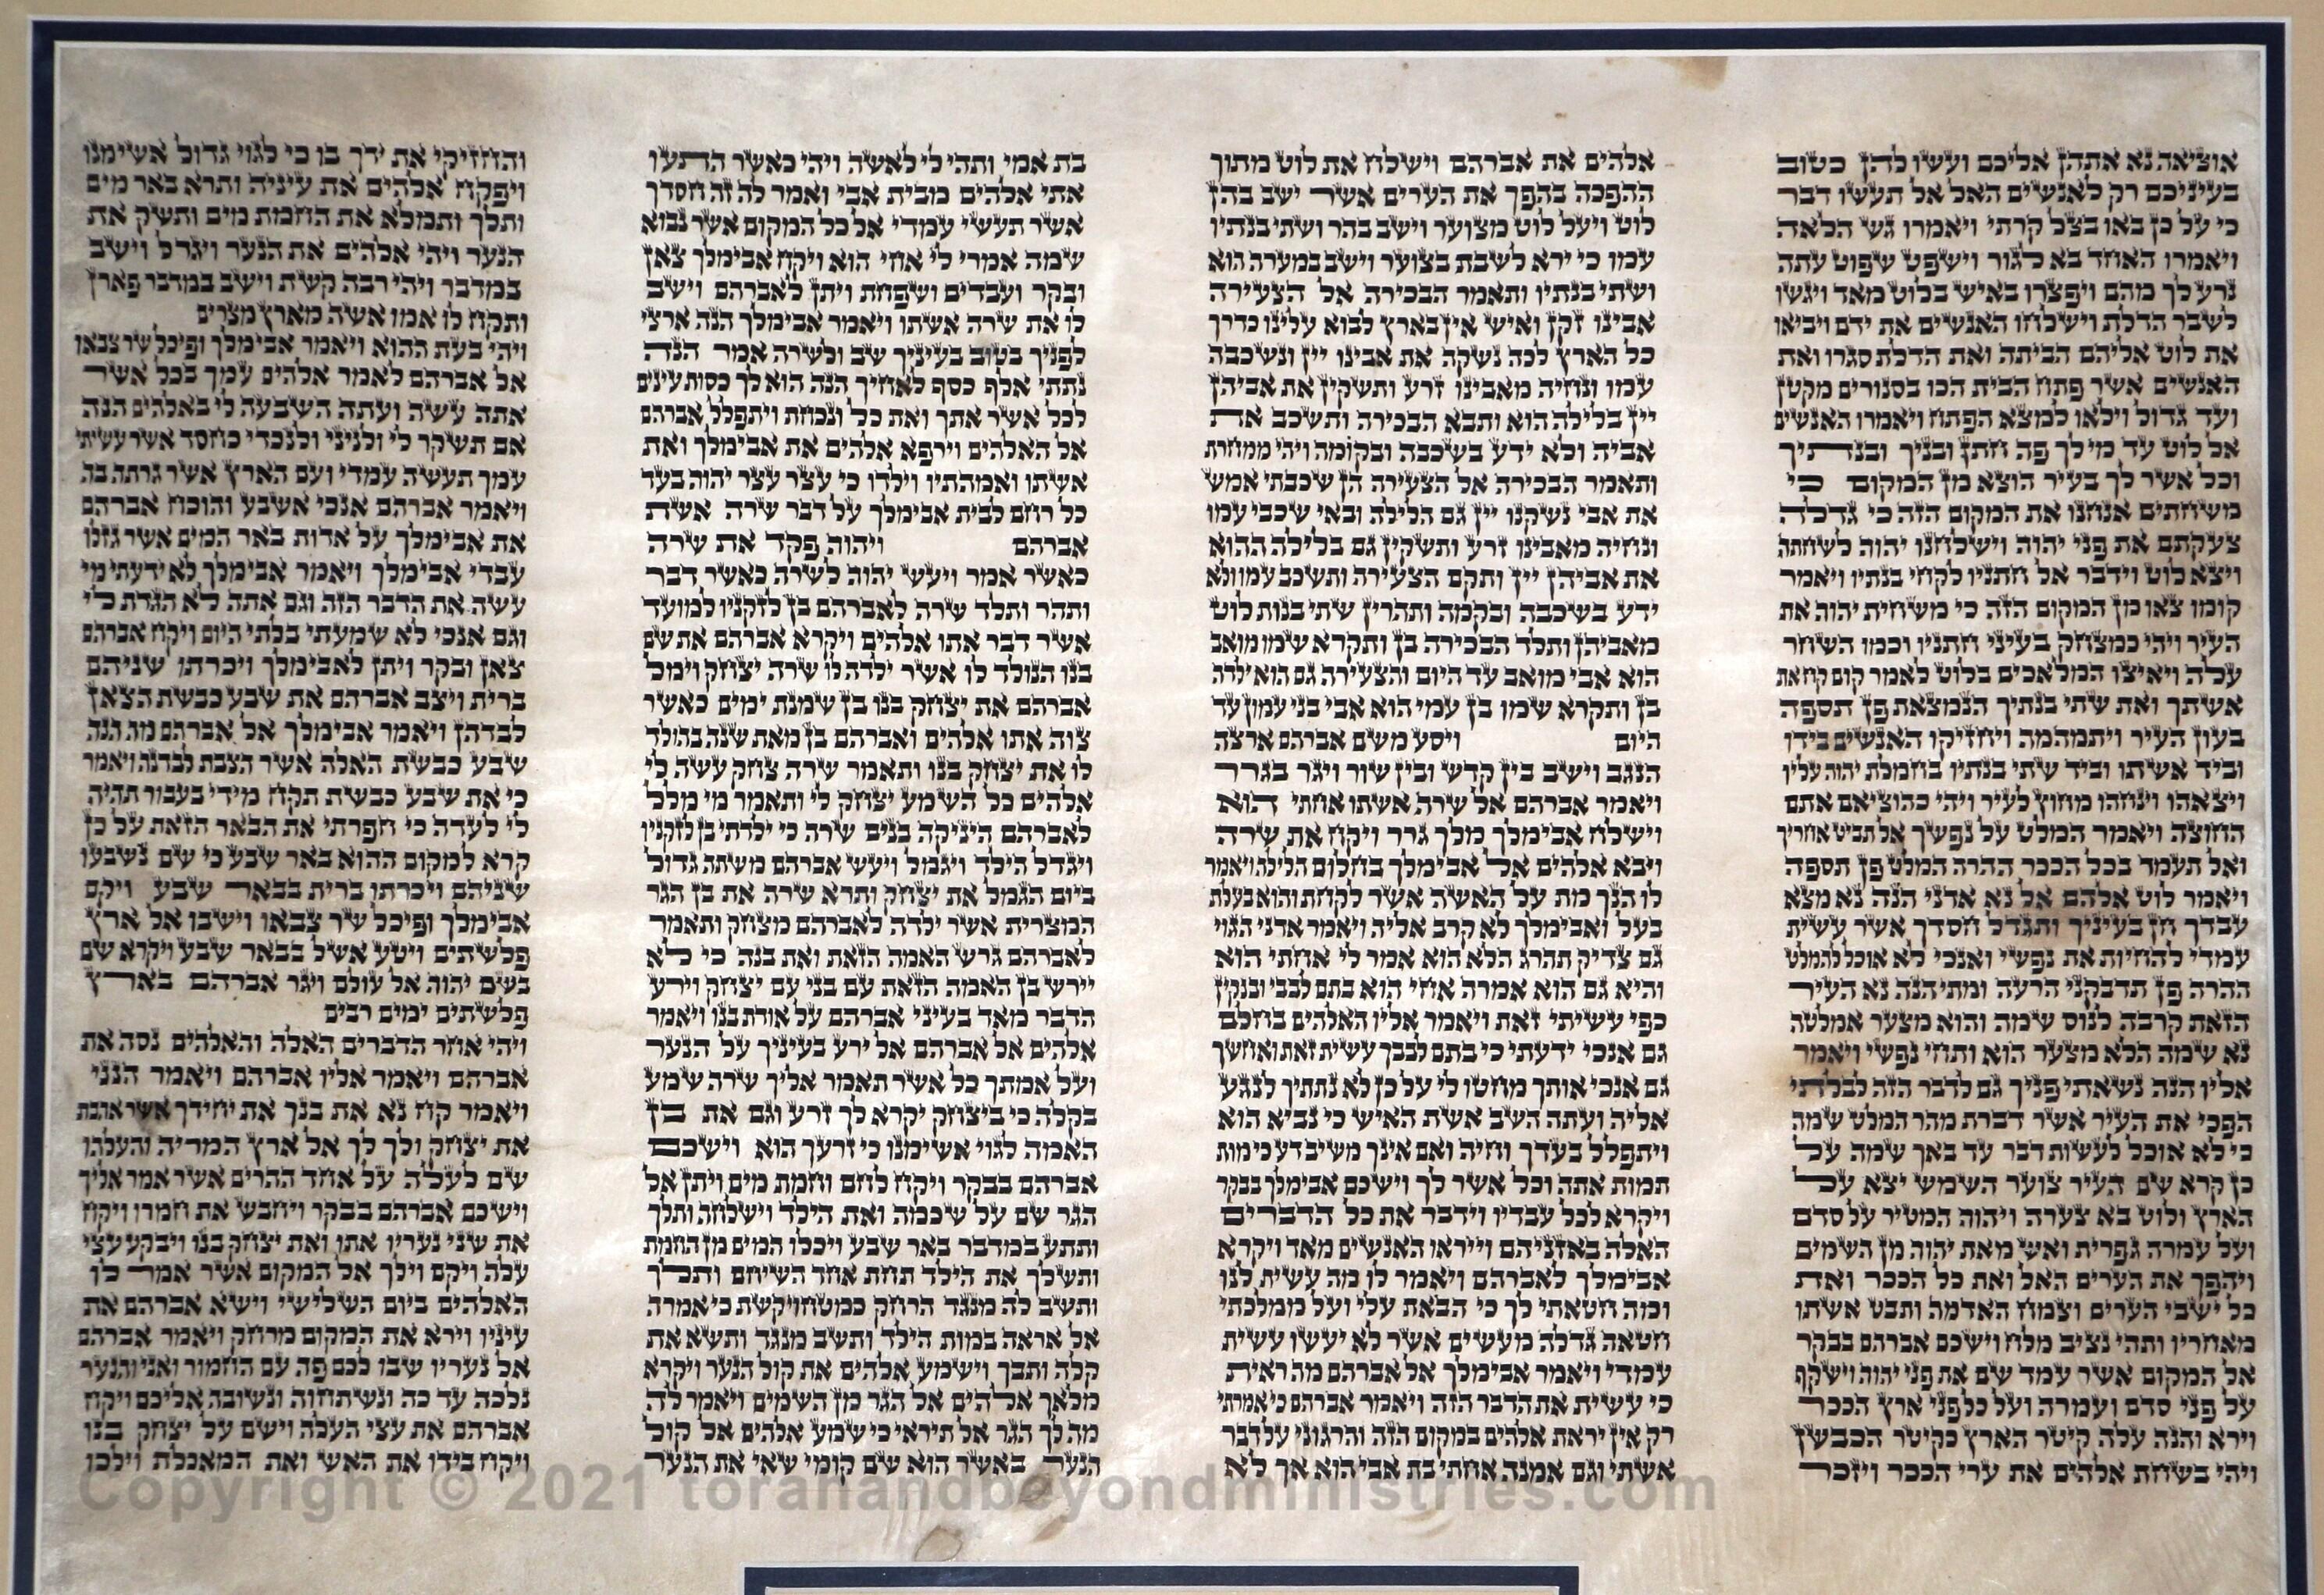 Photograph - The Torah sheet contains Scripture from Genesis 19:8 through Genesis 22:6